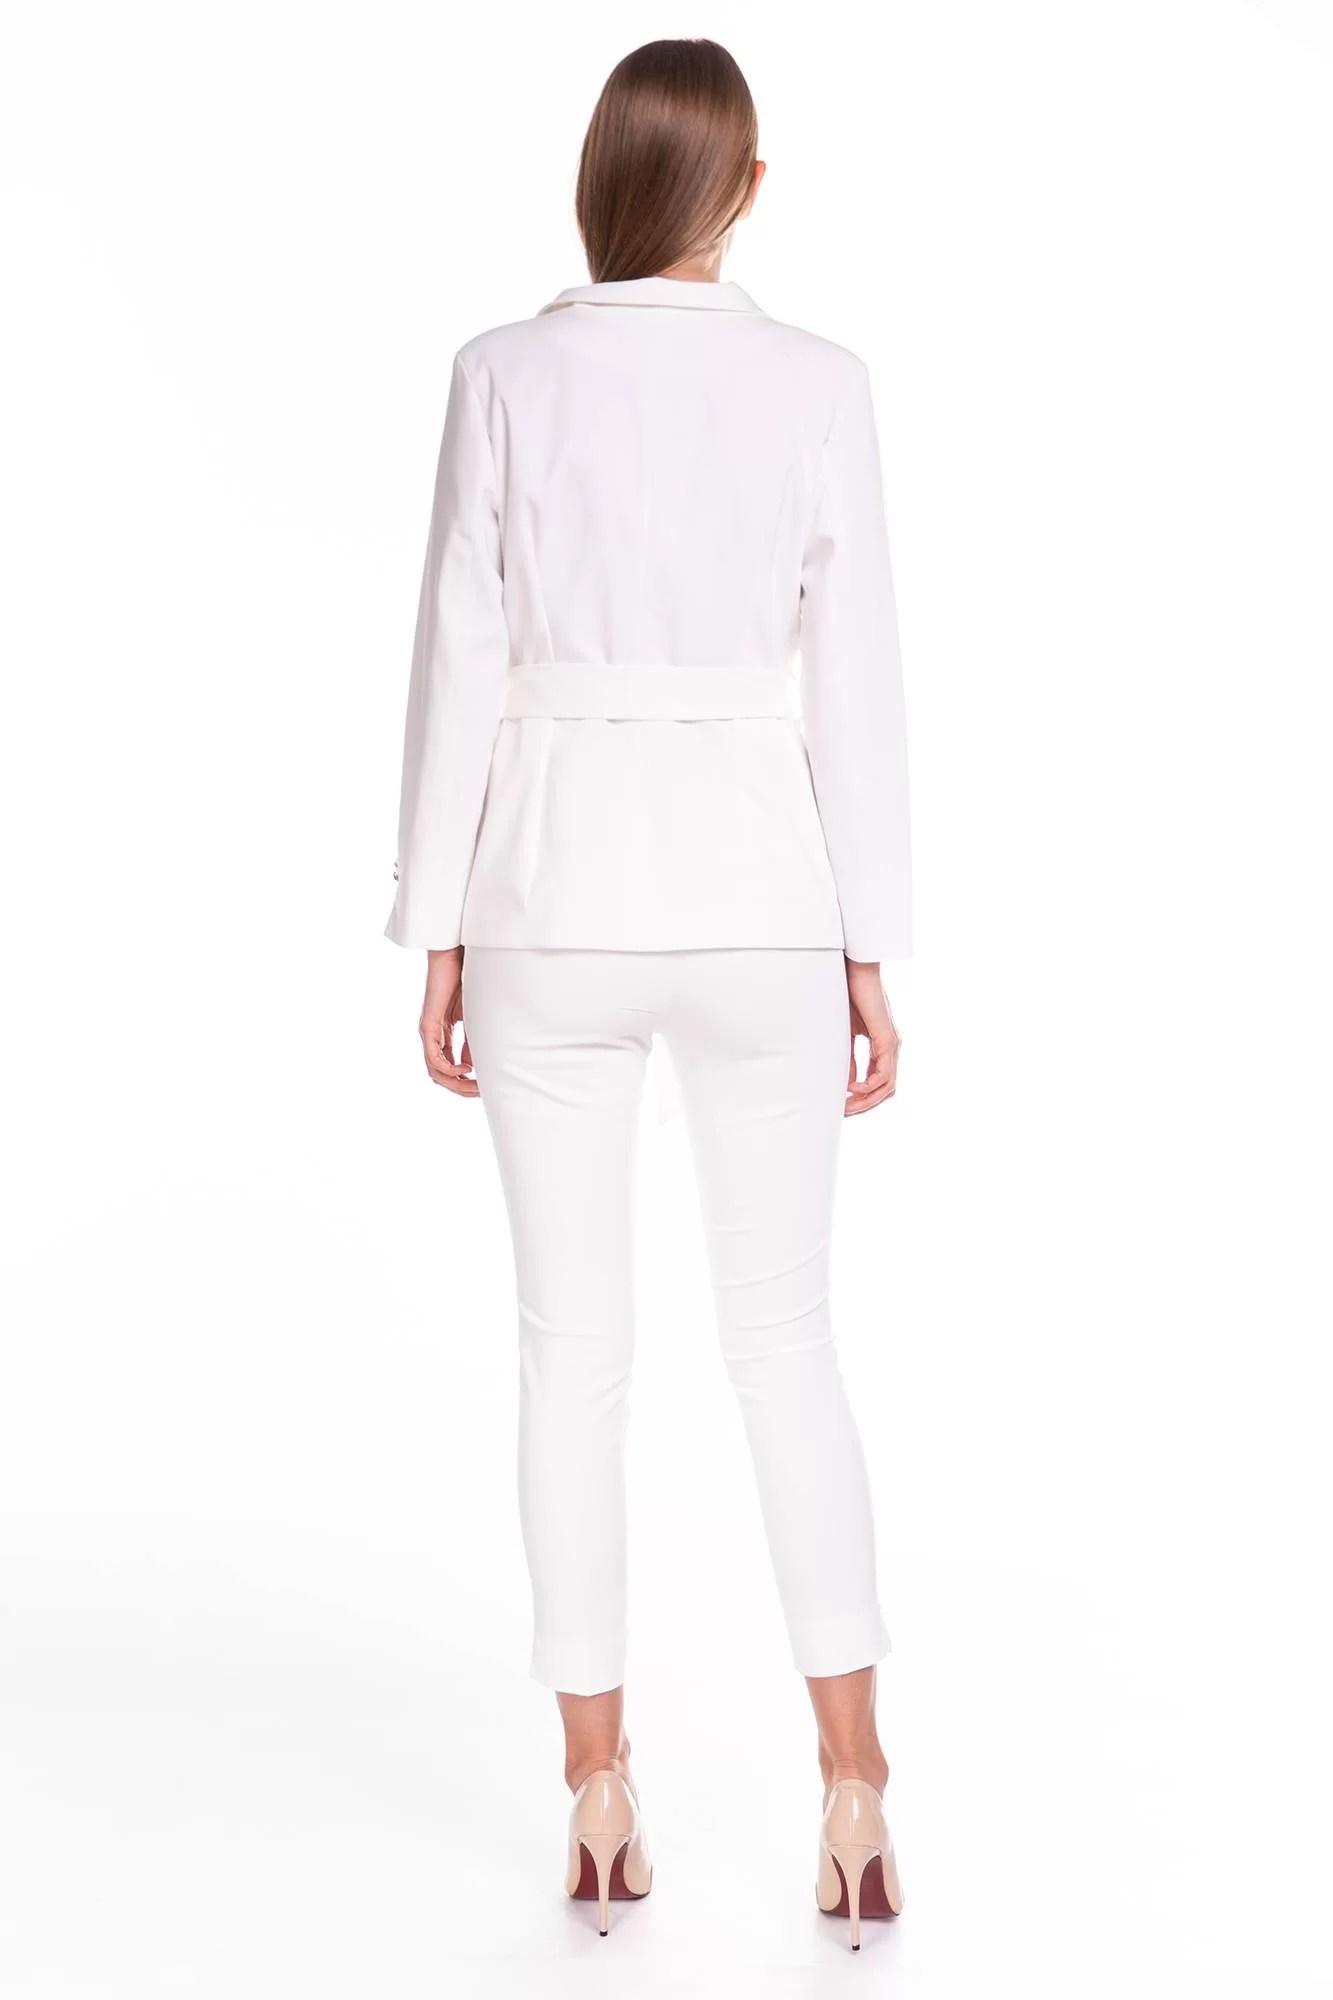 Komplet Glamour Biały